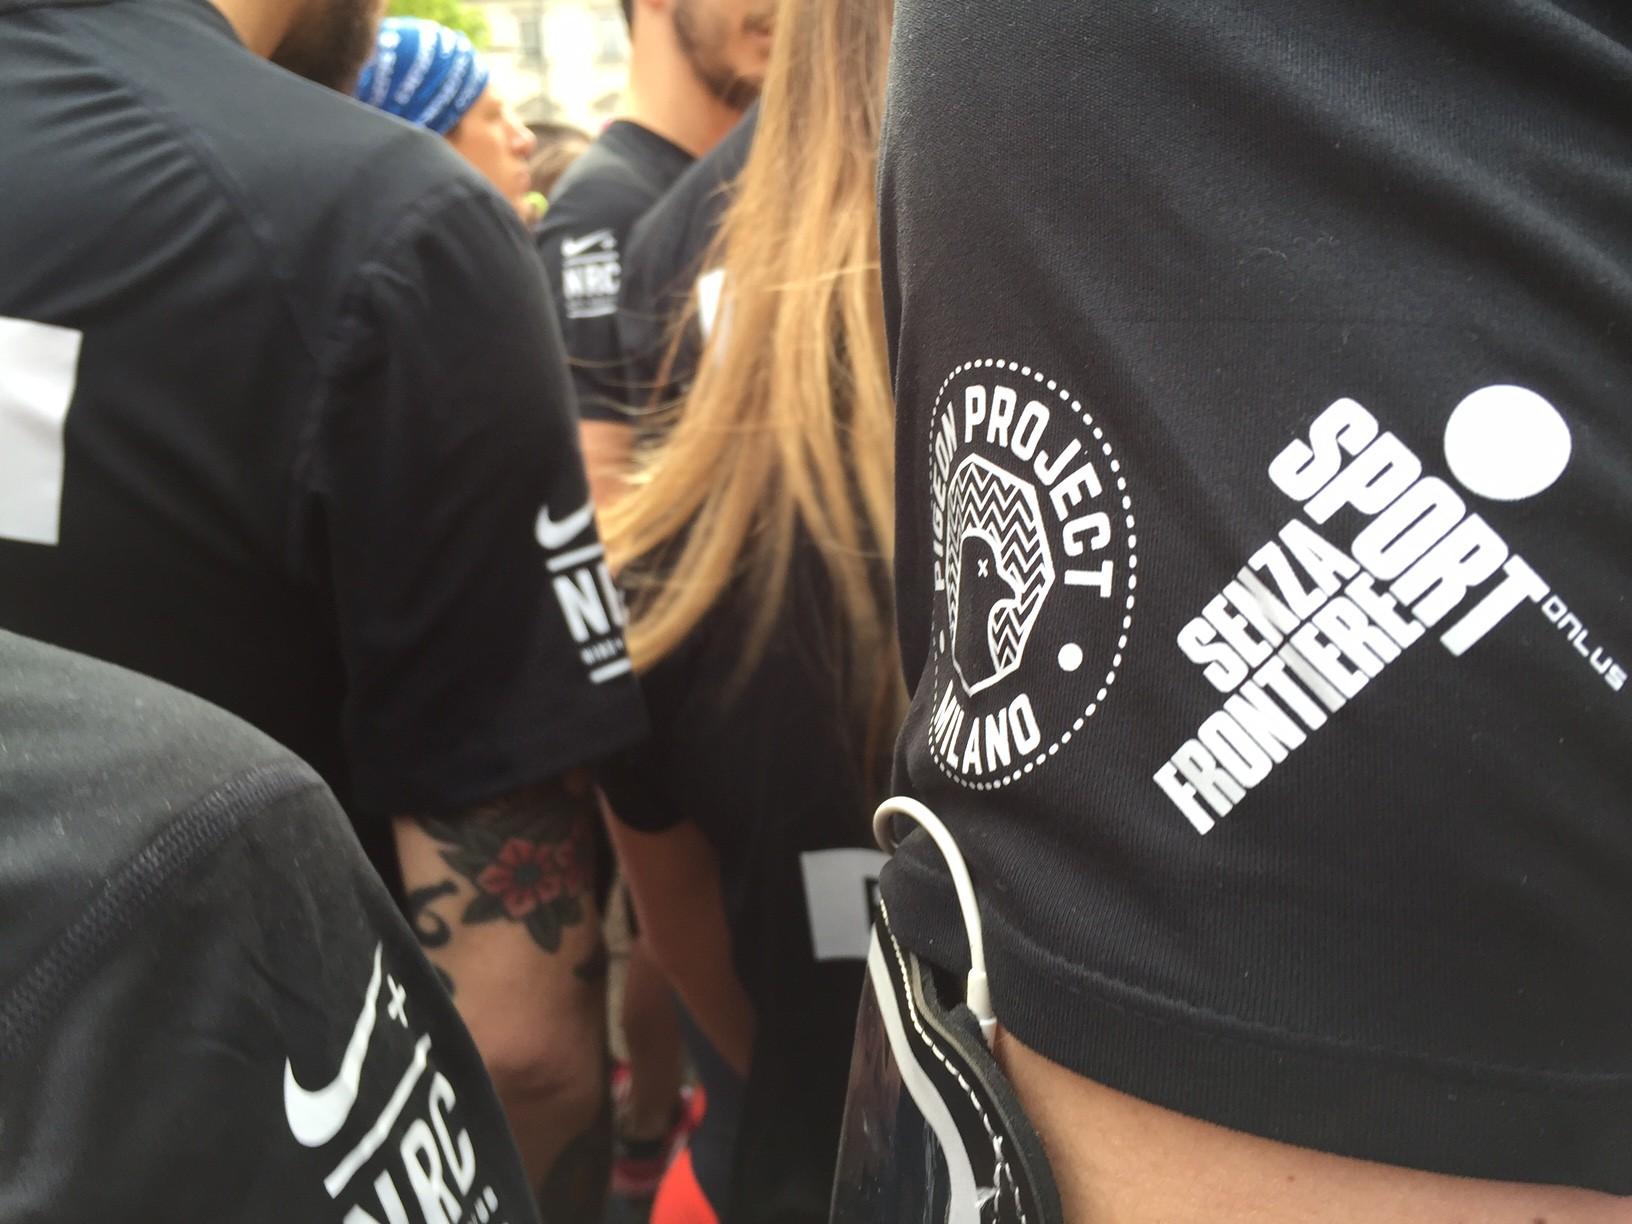 Raccolta fondi Milano Marathon 2018-Pigeon Project Milano